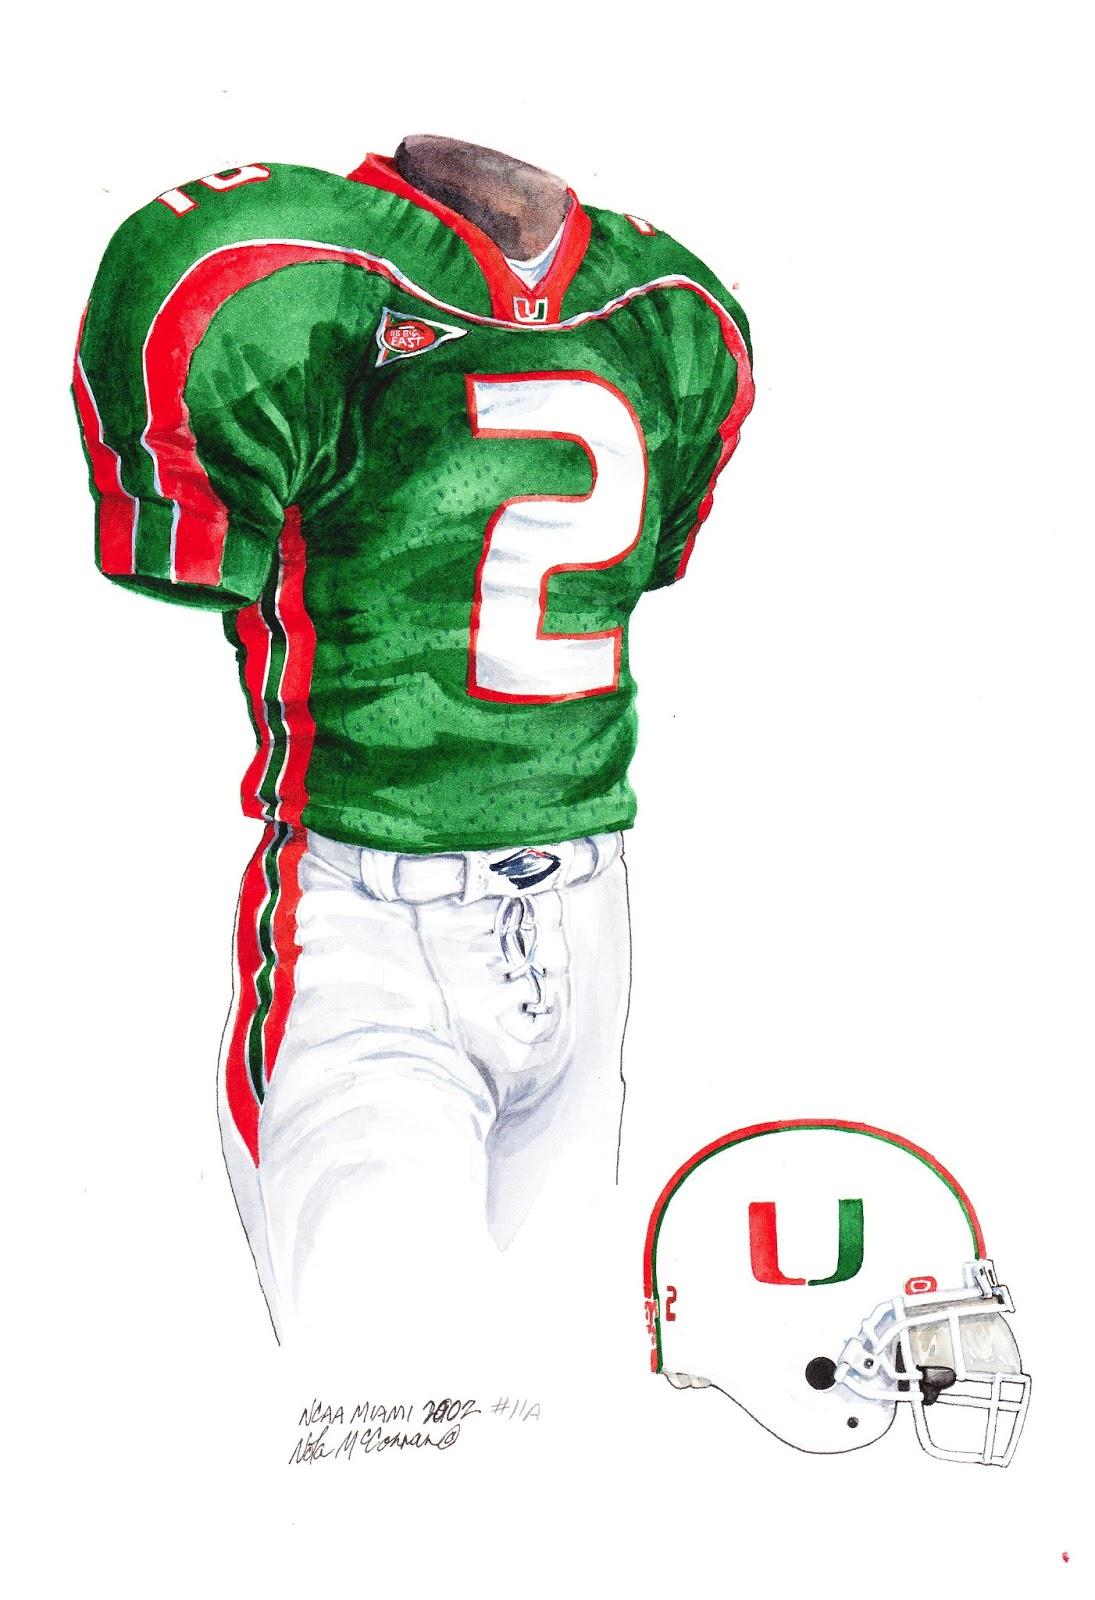 70c20ec99 2002 University of Miami Hurricanes football uniform original art for sale